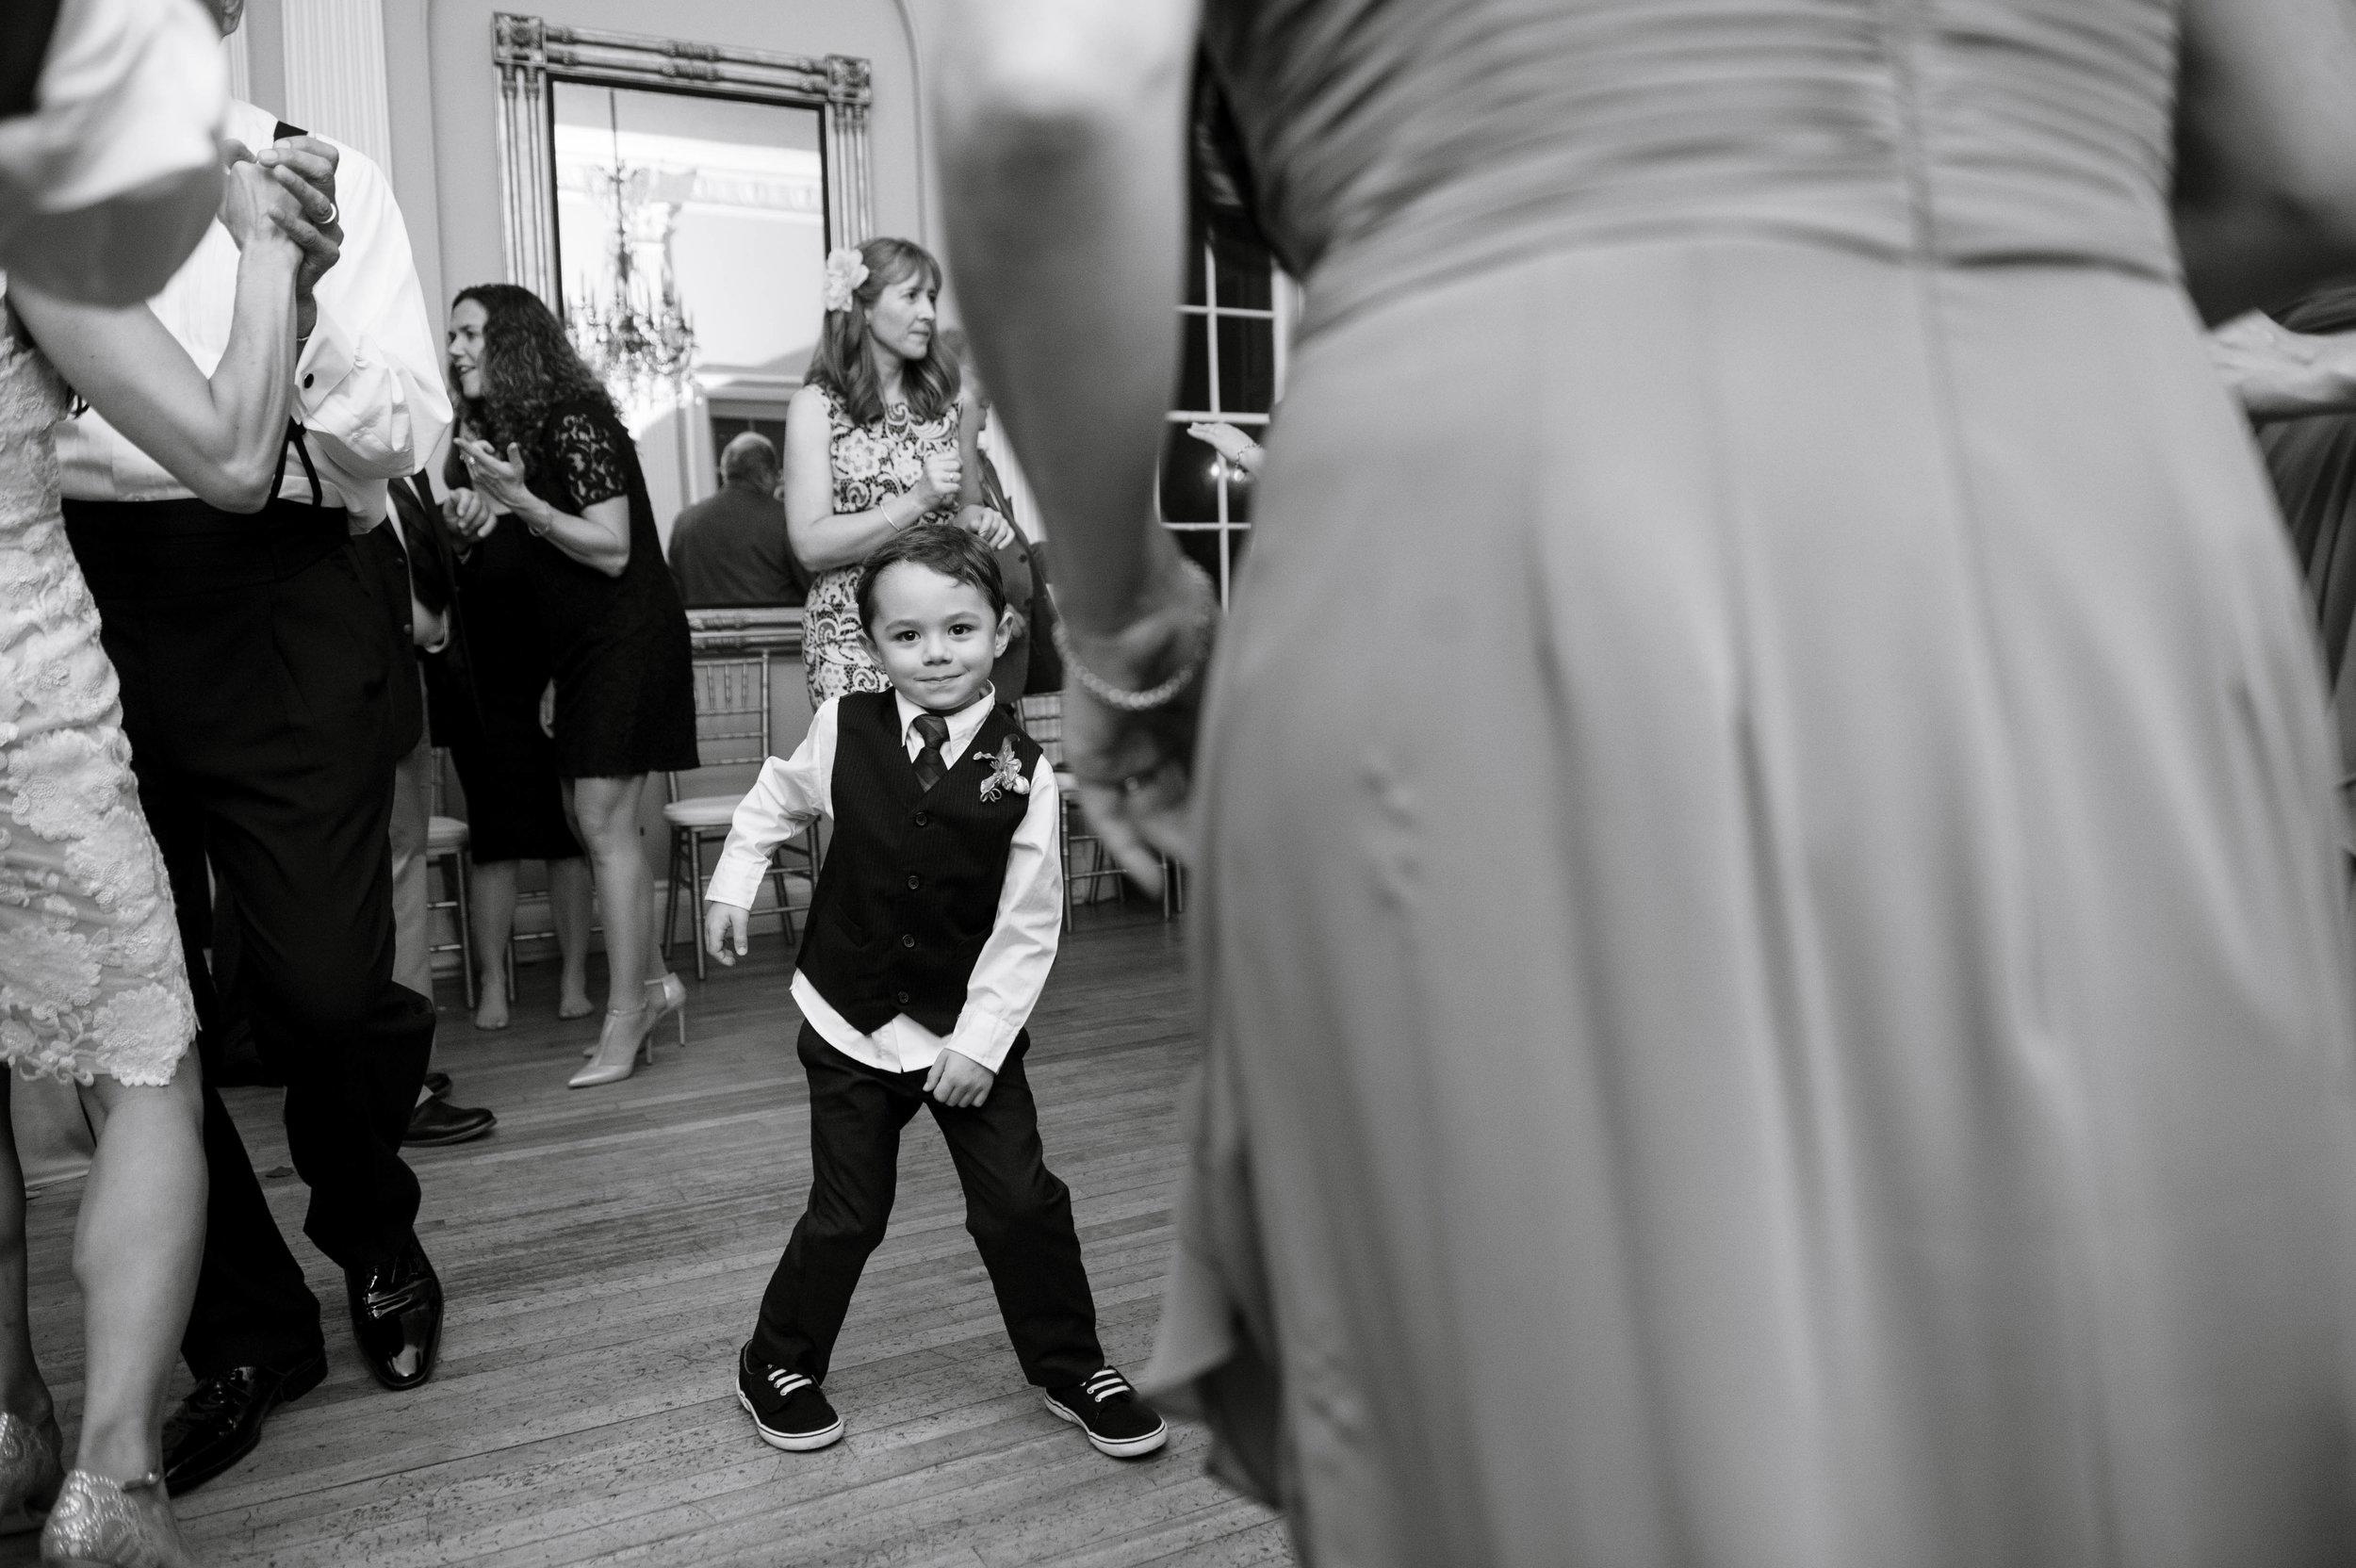 Candid-Wedding-Photography-Boston15.jpg